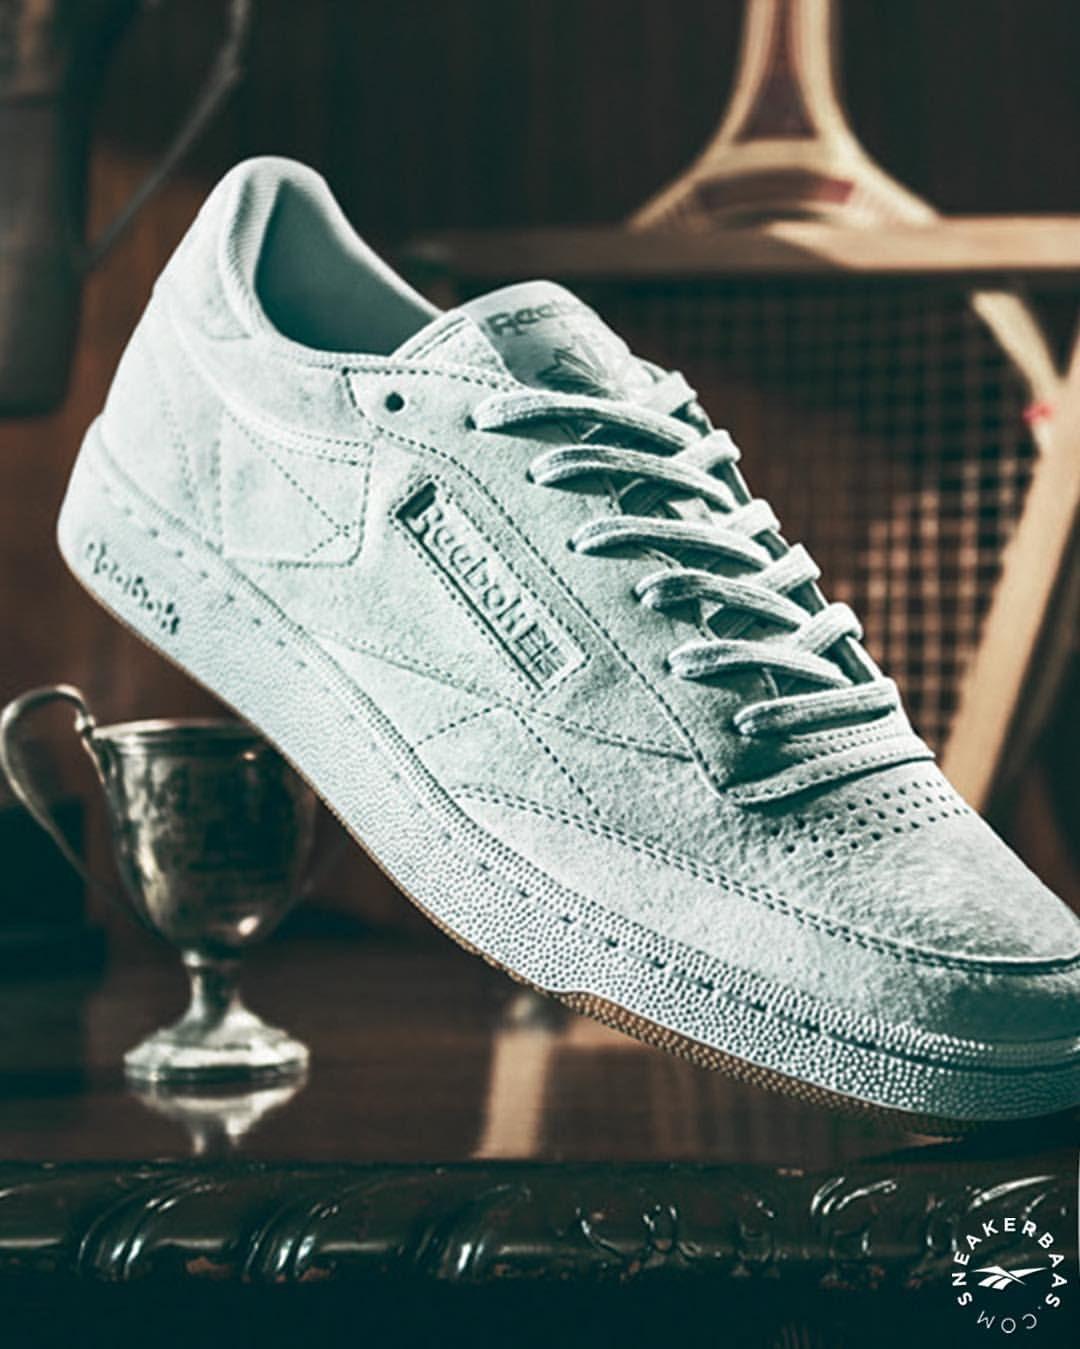 74a590c44b71b Reebok Classics Club C 85 TG x Kendrick Lamar  sneakers  sneakernews   StreetStyle  Kicks  adidas  nike  vans  newbalance  puma  ADIDAS  ASICS   CONVERSE ...